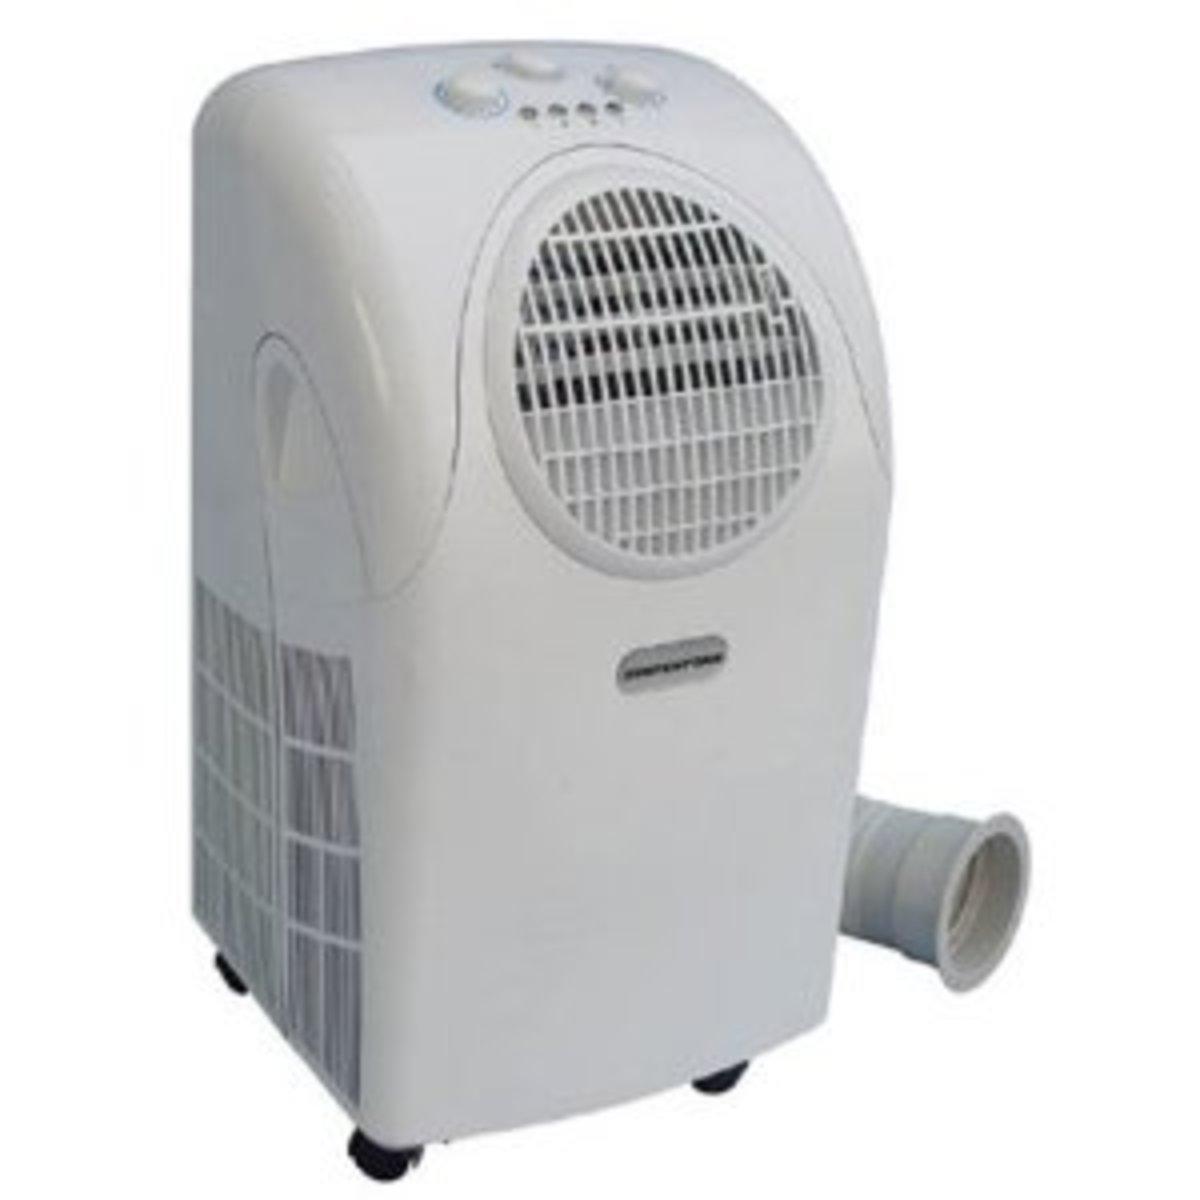 SPT Portable Air Conditioner, 7500 BTUs, WA-7500M